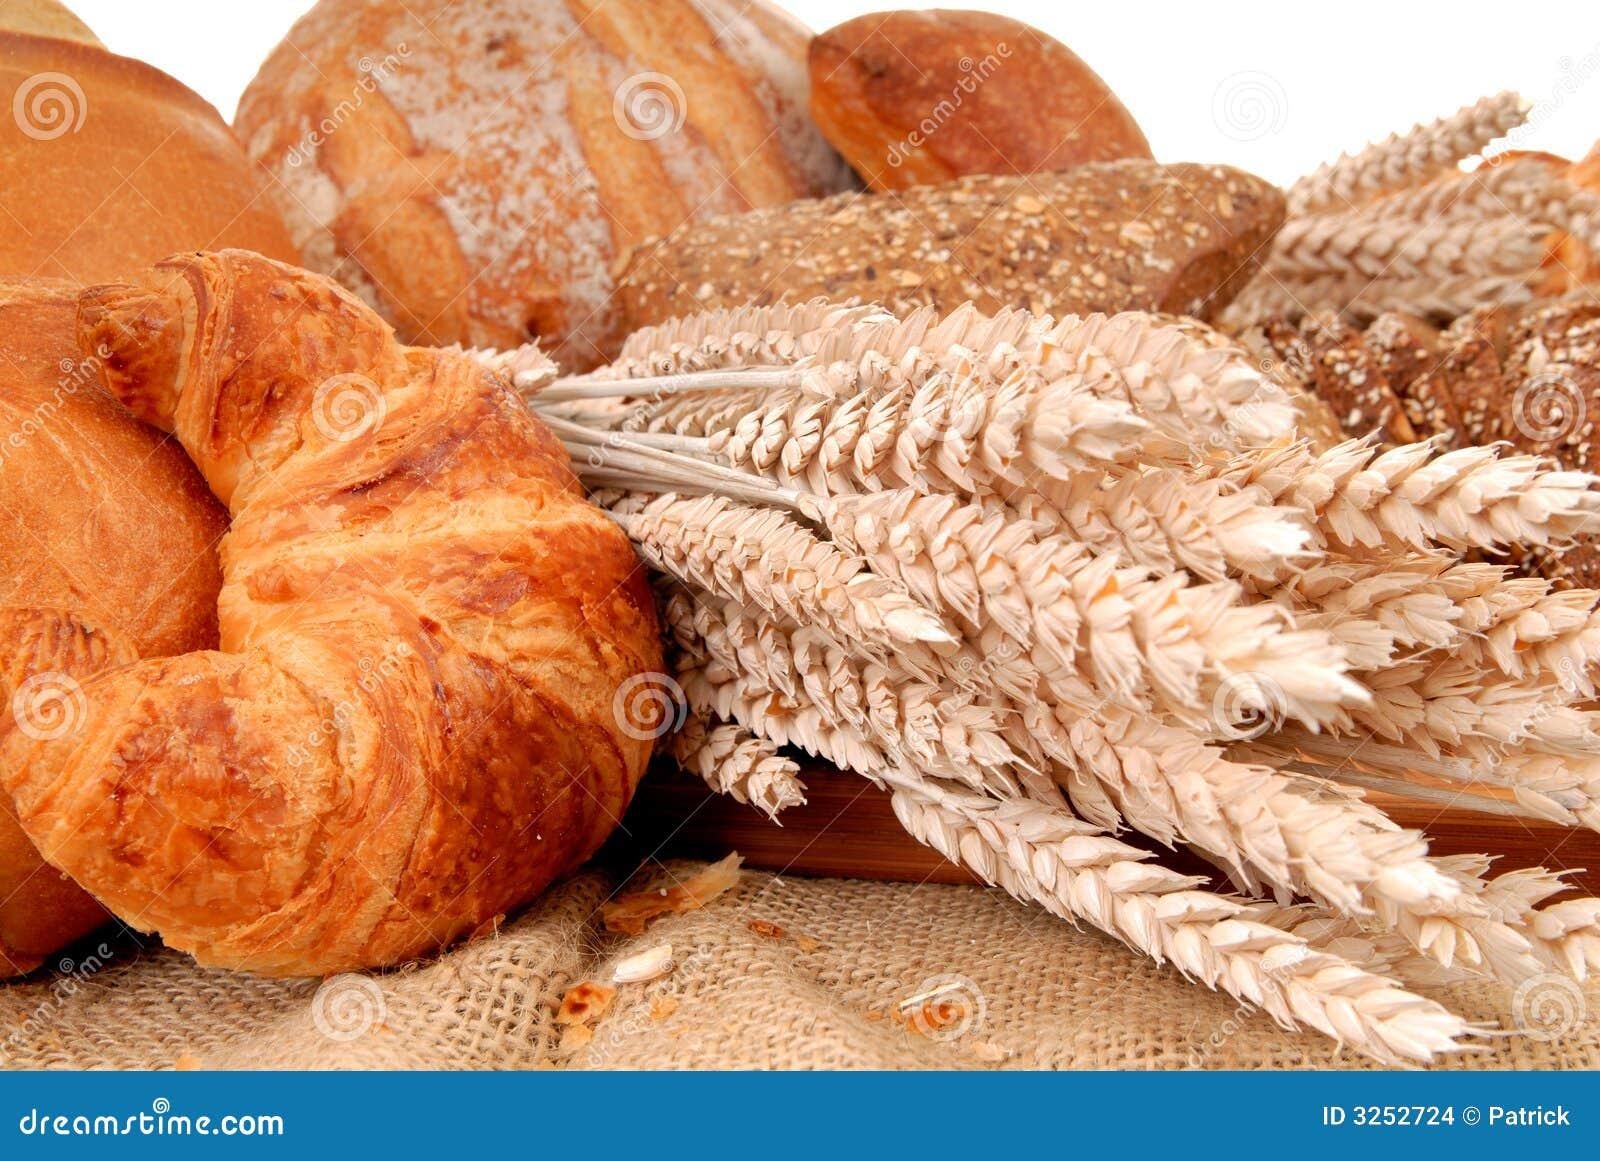 Varied Bread Display Stock Photo Image Of Crusty Bake